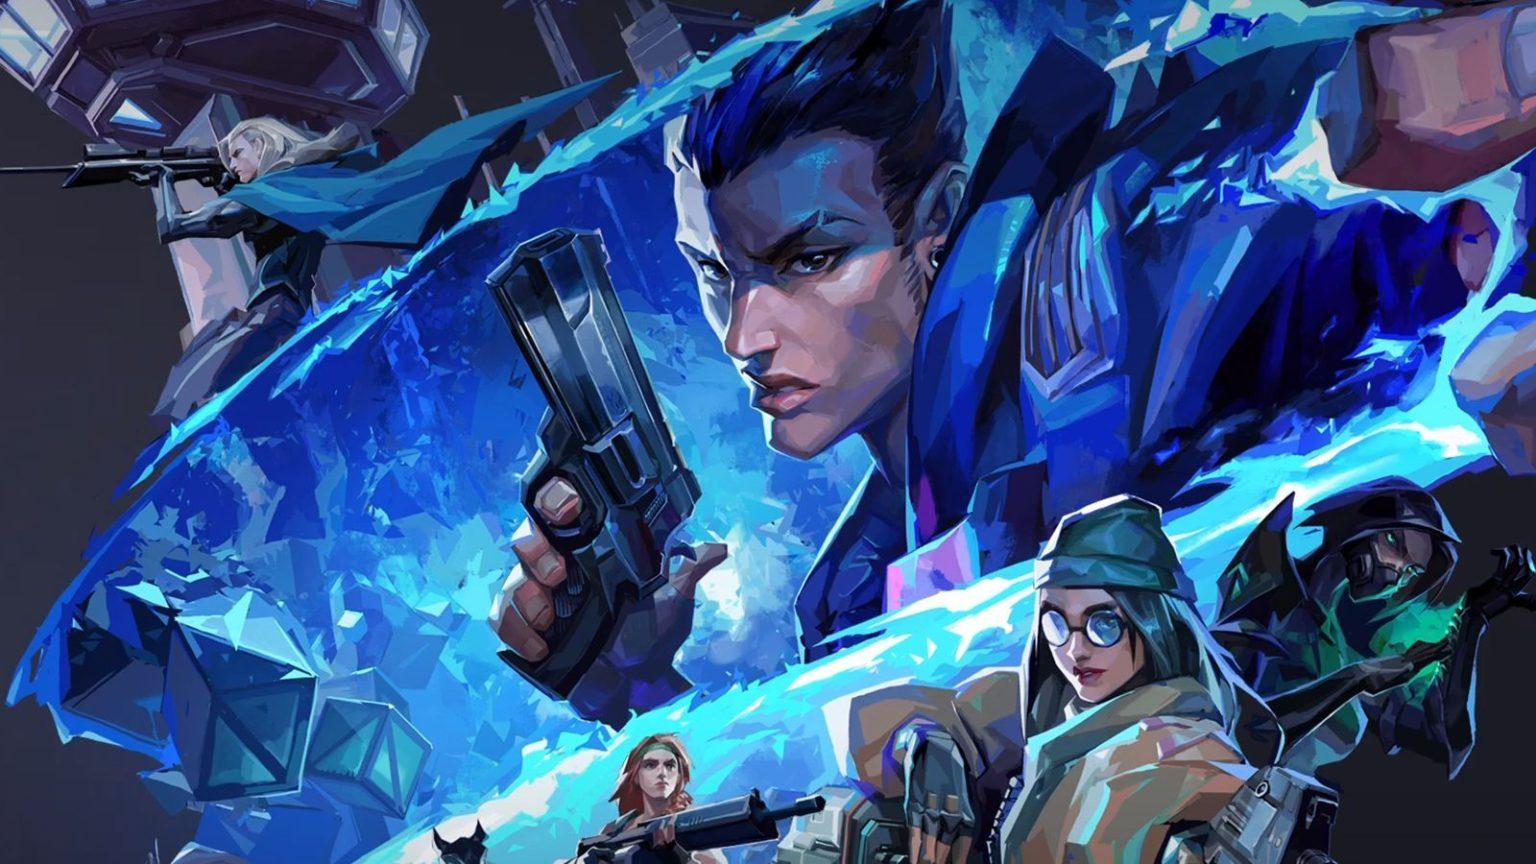 Riot Games drops VALORANT ranked queue hotfix to 'tighten matchmaking  skill'